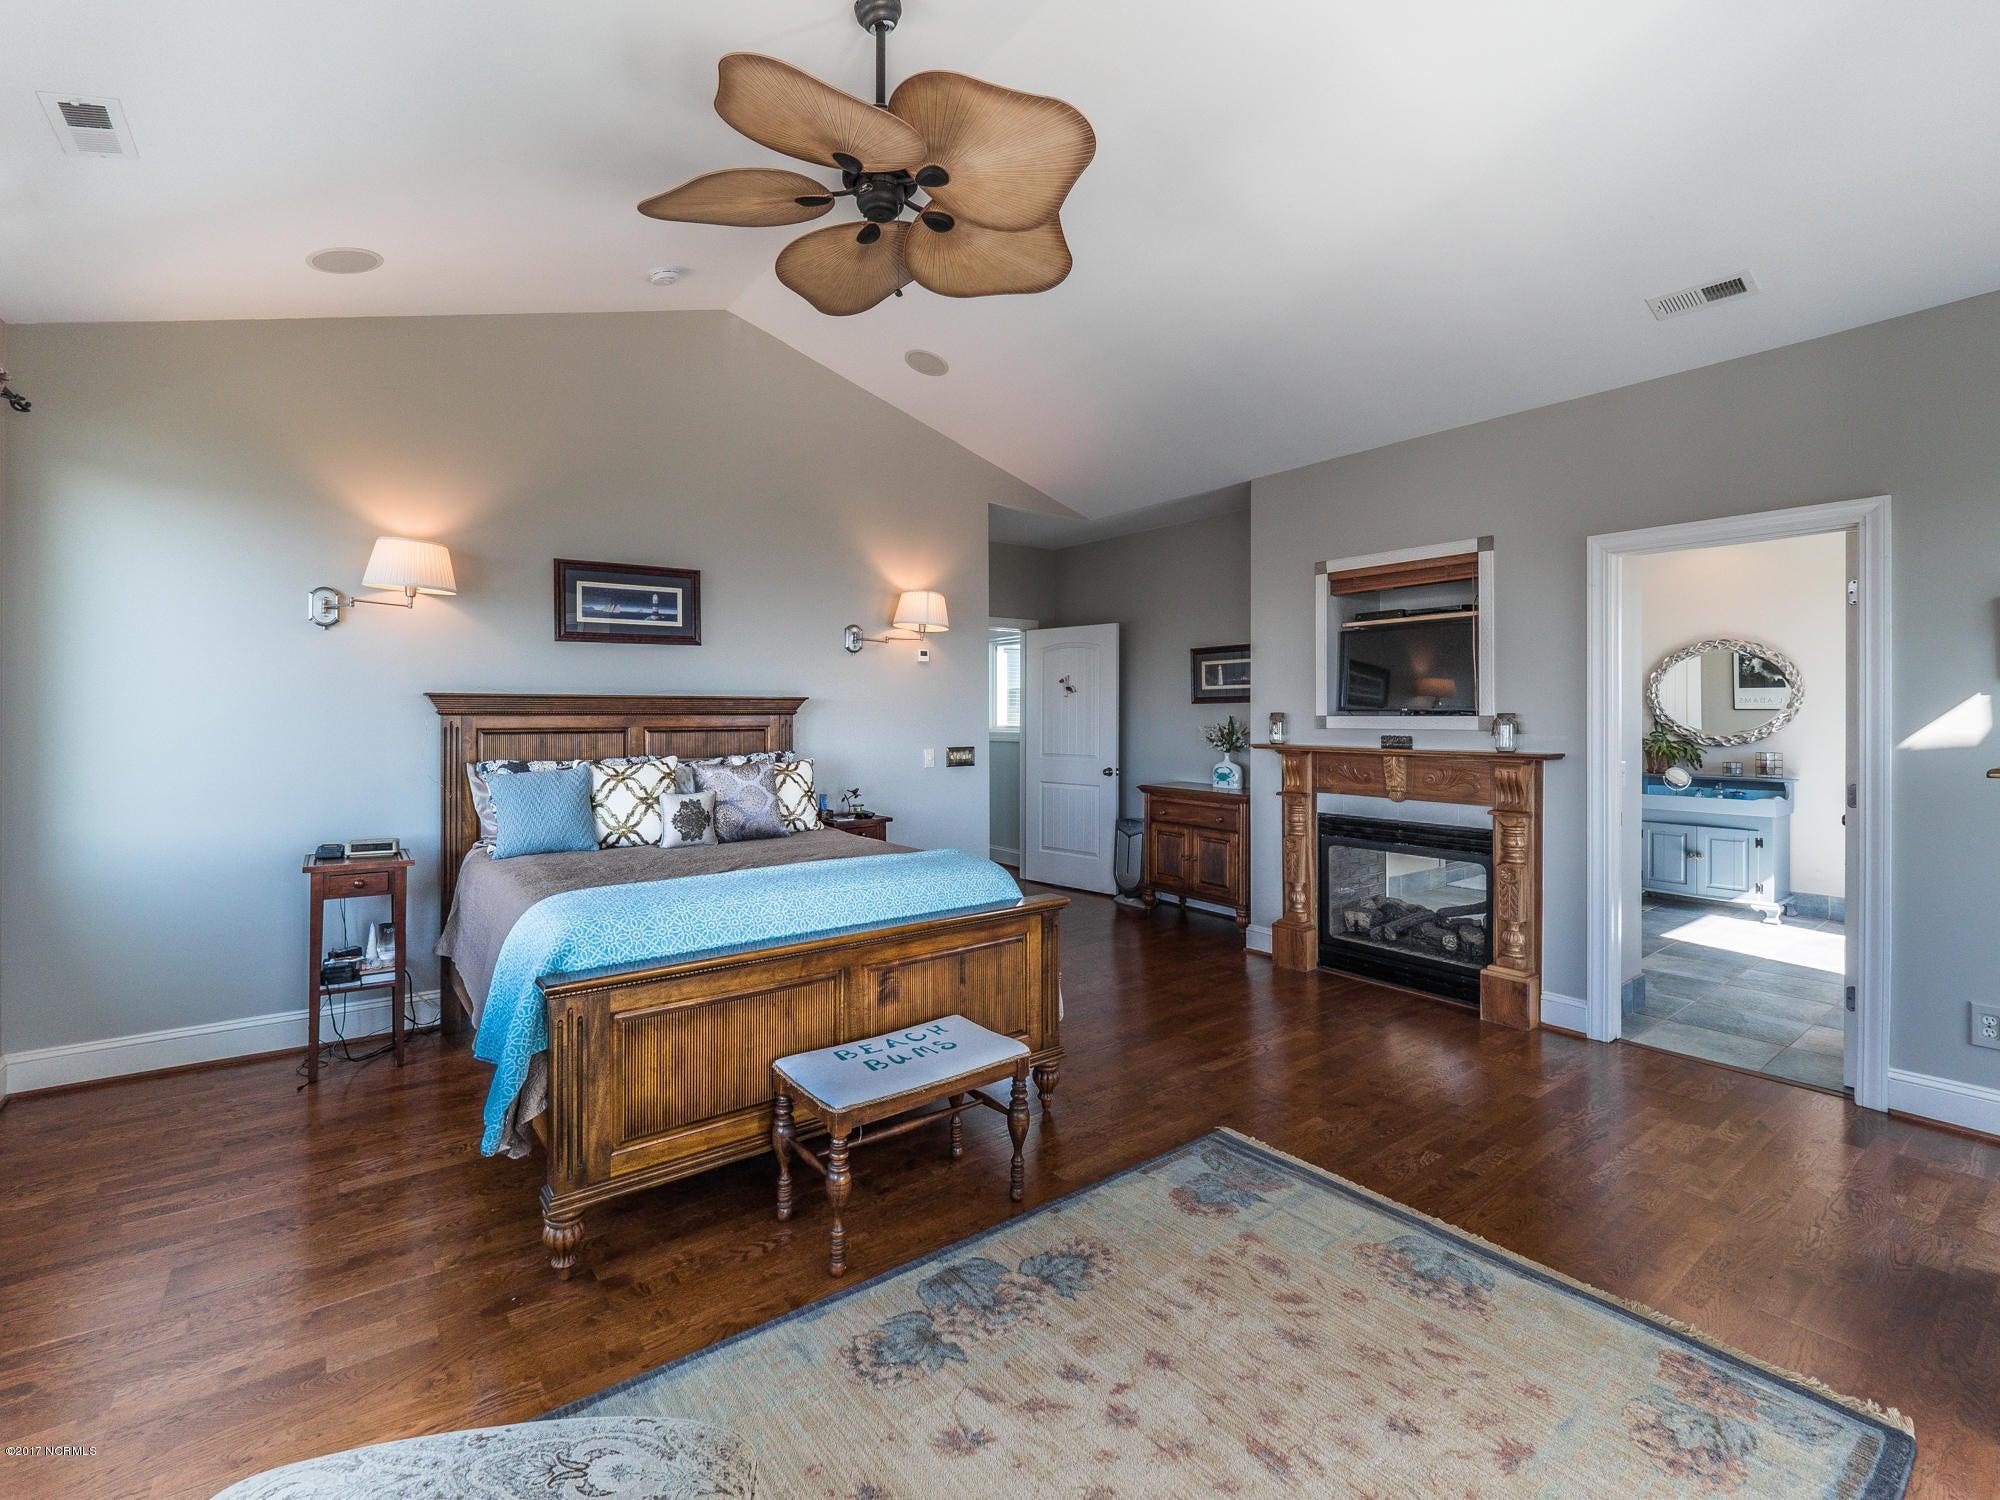 Turtle Creek Real Estate - http://cdn.resize.sparkplatform.com/ncr/1024x768/true/20171027130916068651000000-o.jpg